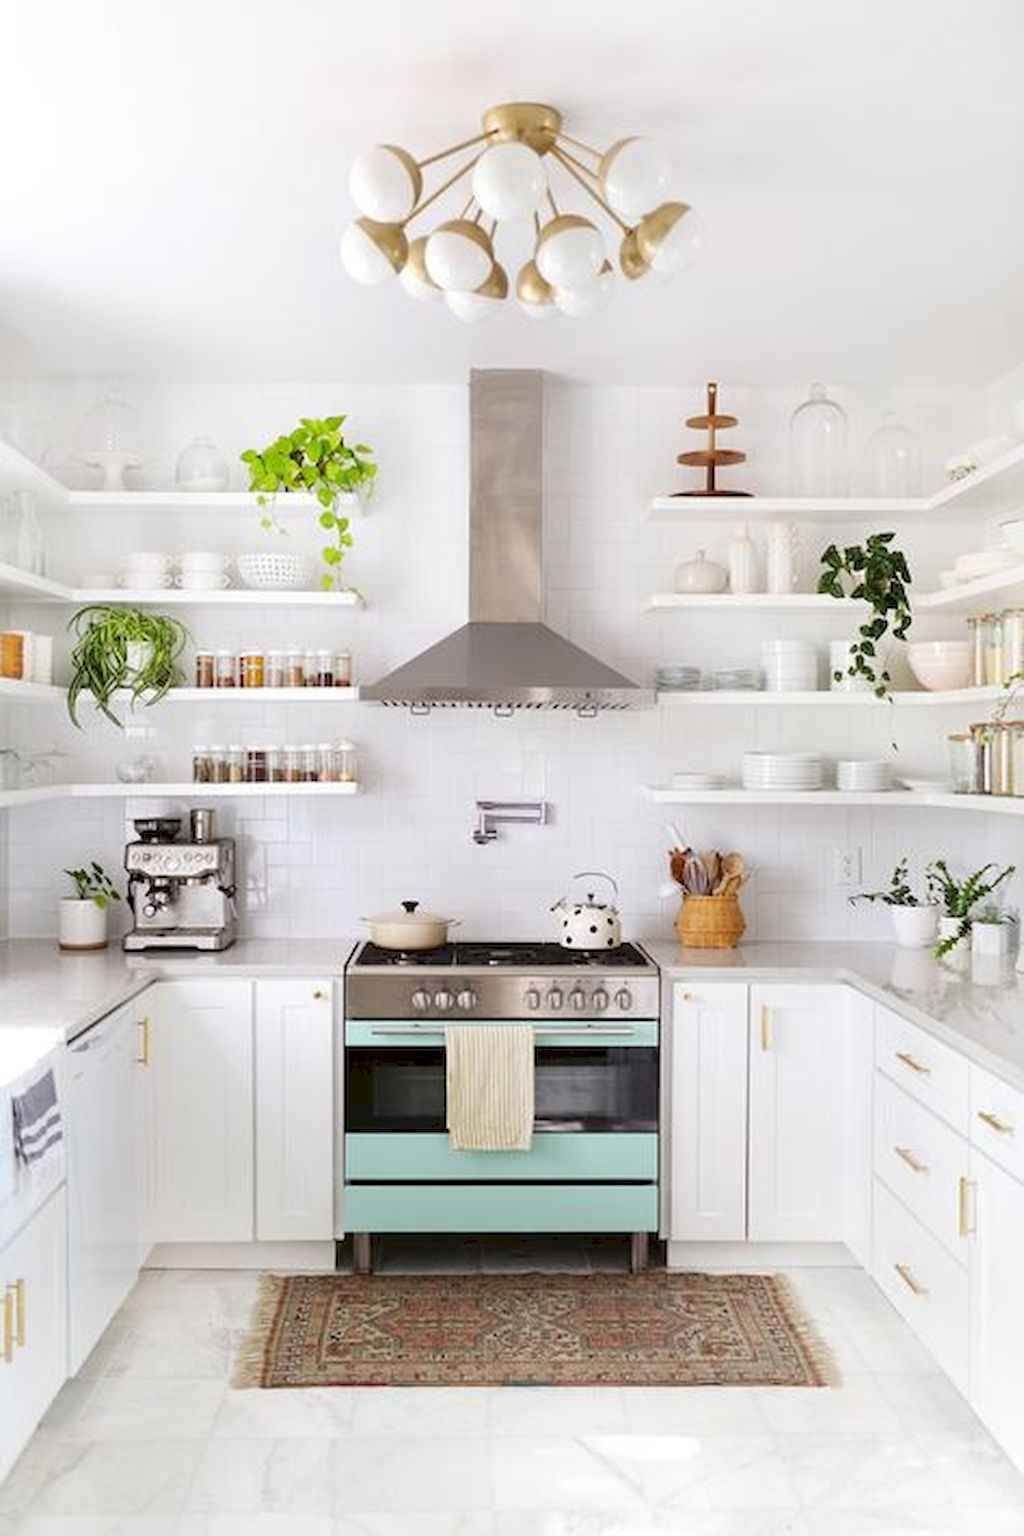 Mid century modern kitchen design ideas (4)